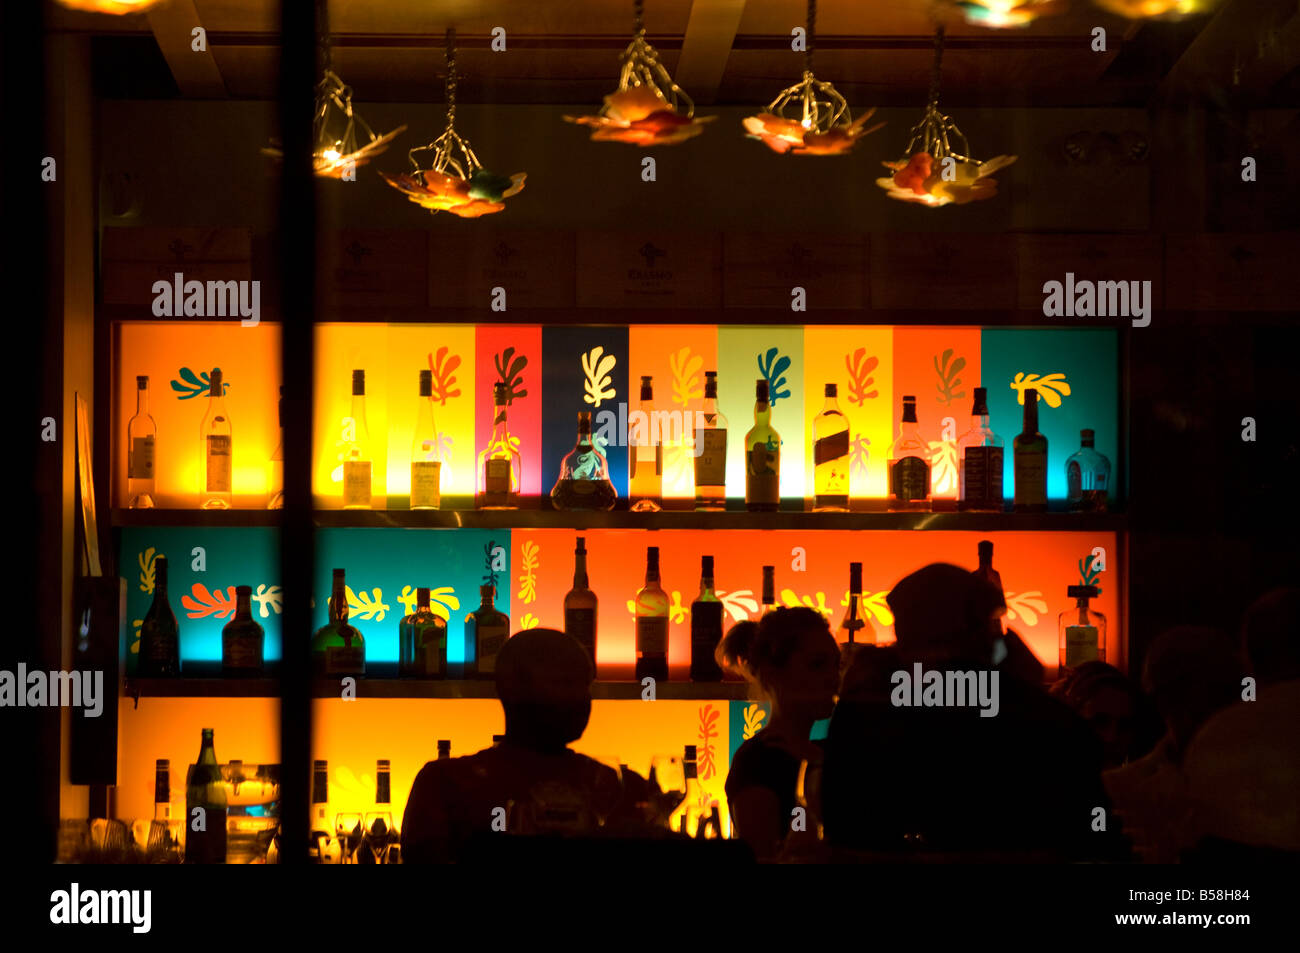 Nizza bar, Montreal, Quebec, Canada, North America - Stock Image